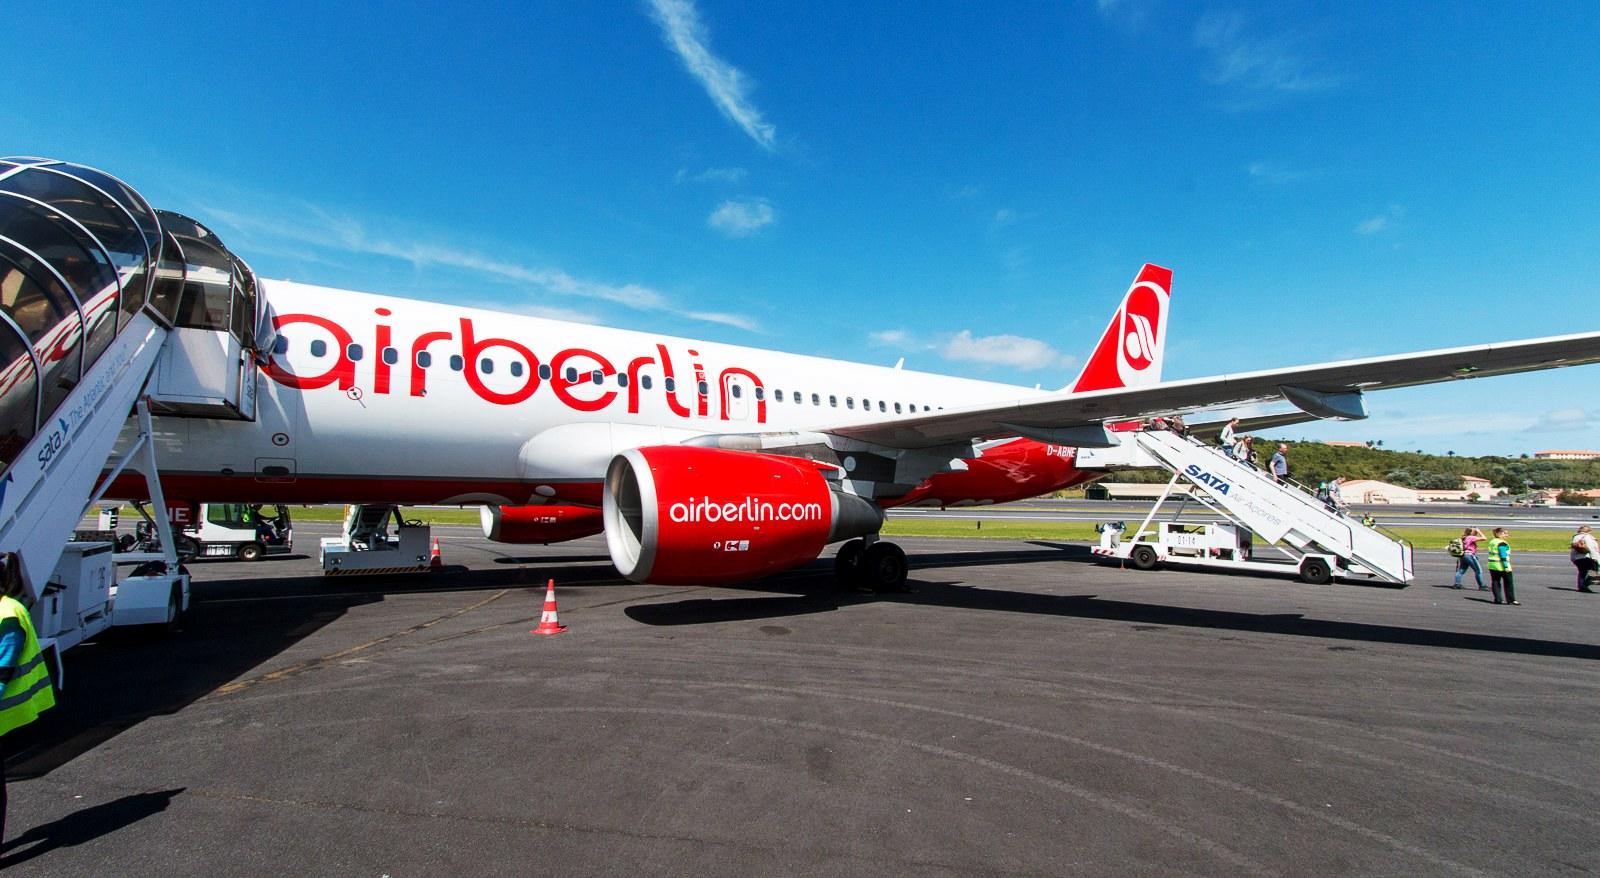 B-Air_Berlin_Airbus_A320_D_ABNE_auf_dem_Flughafen_Lajes_Field_TER_auf_Terceira